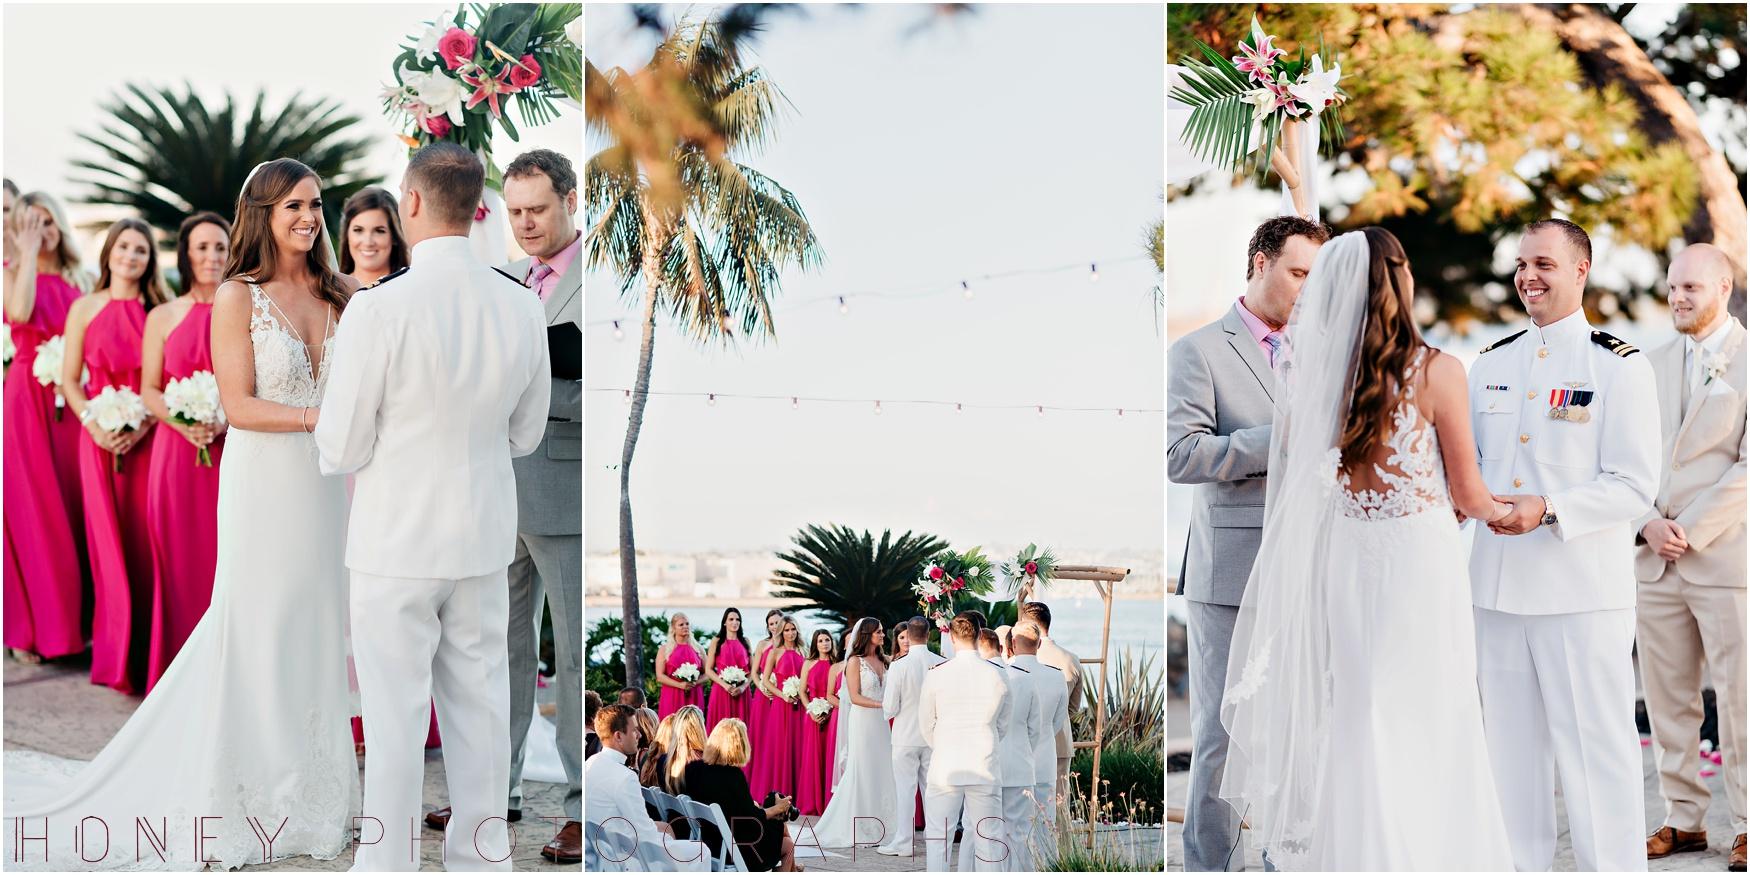 bali-hai-tropical-bubble-exit-party-paradise-wedding025.jpg